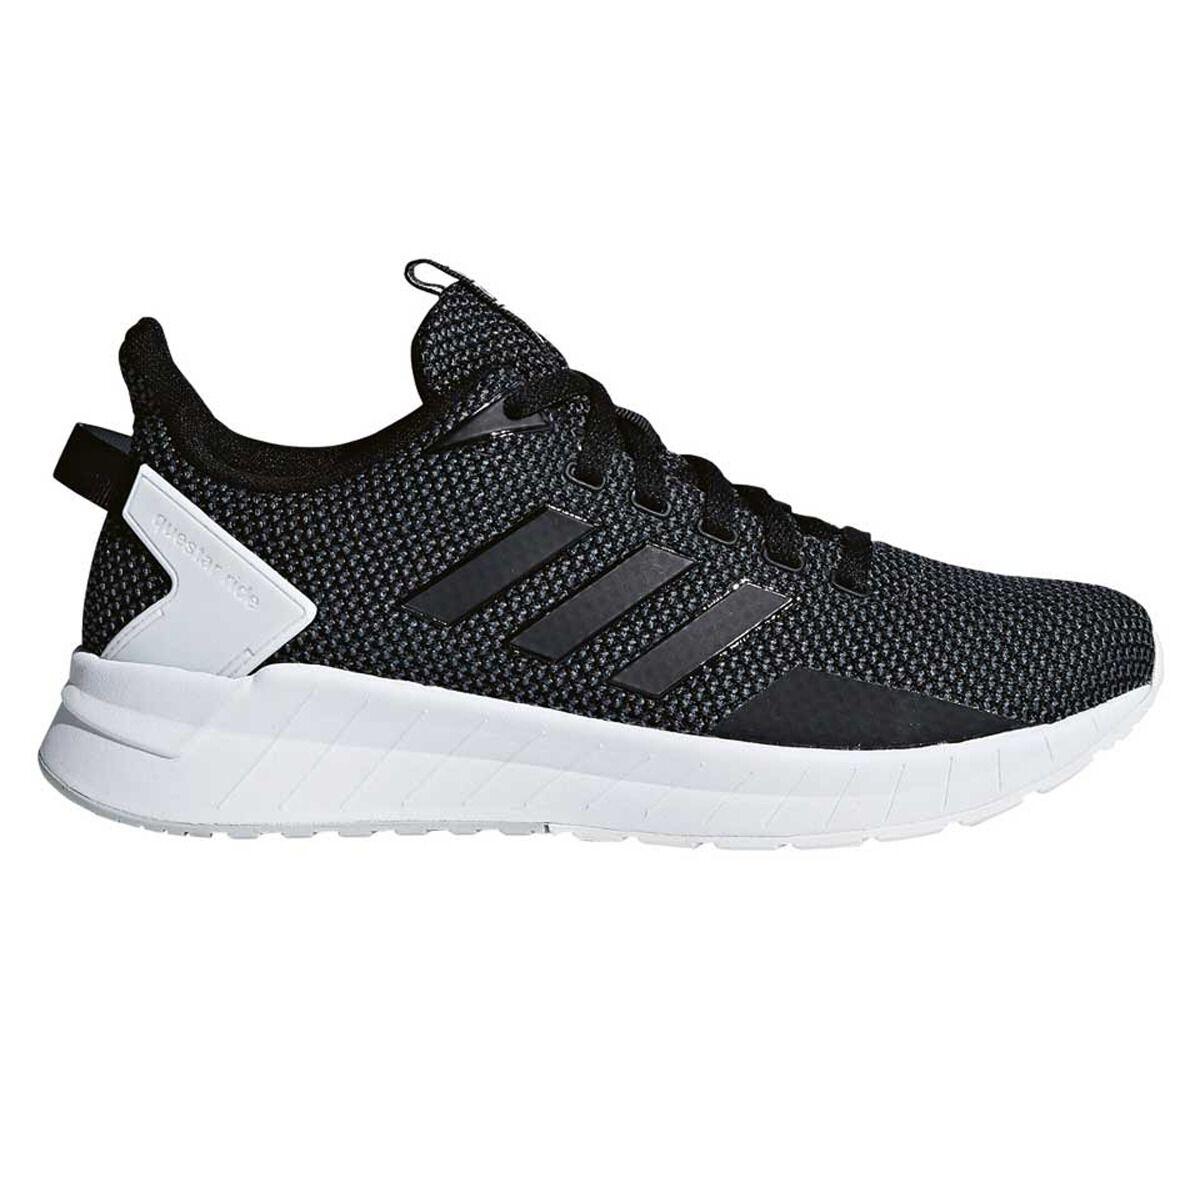 adidas Questar Ride Womens Running Shoes Black White US 6.5